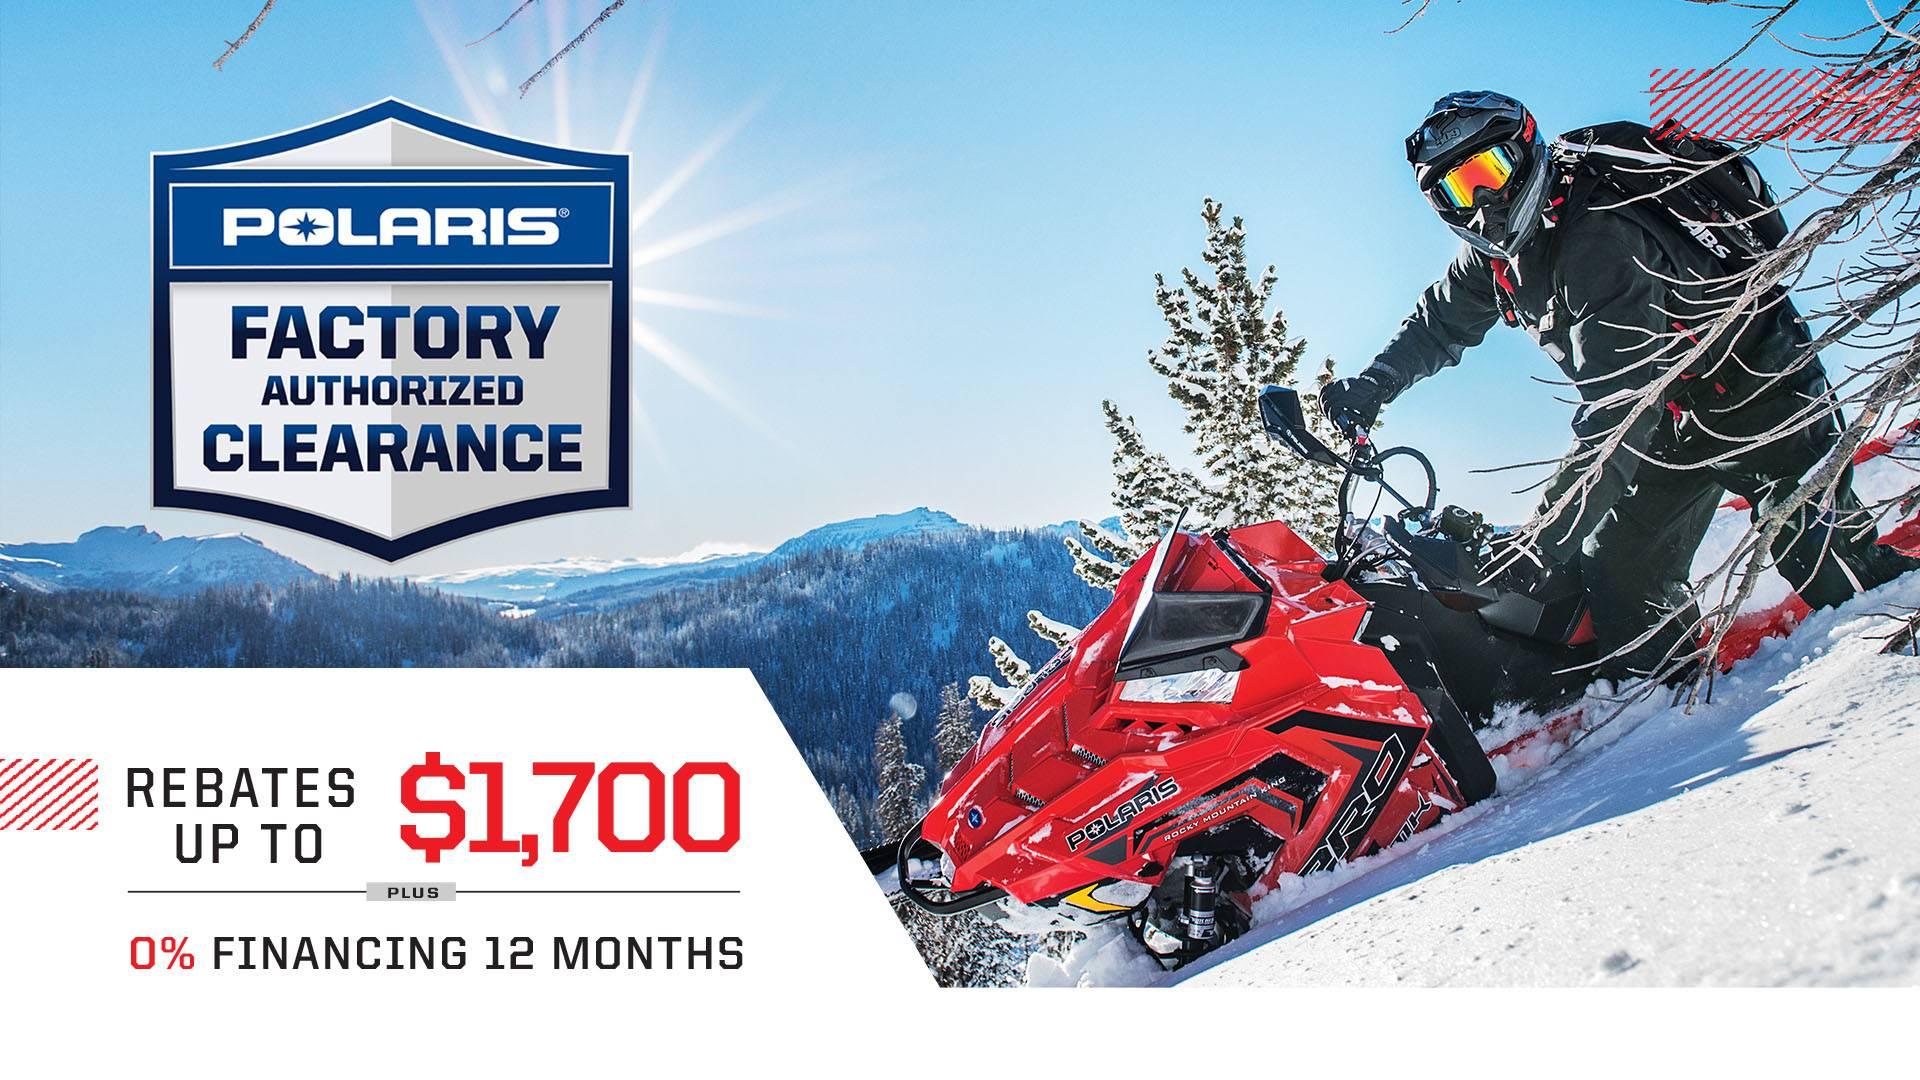 Sport-O-Motive in Appleton, Wisconsin | Snowmobile & Boats for Sale